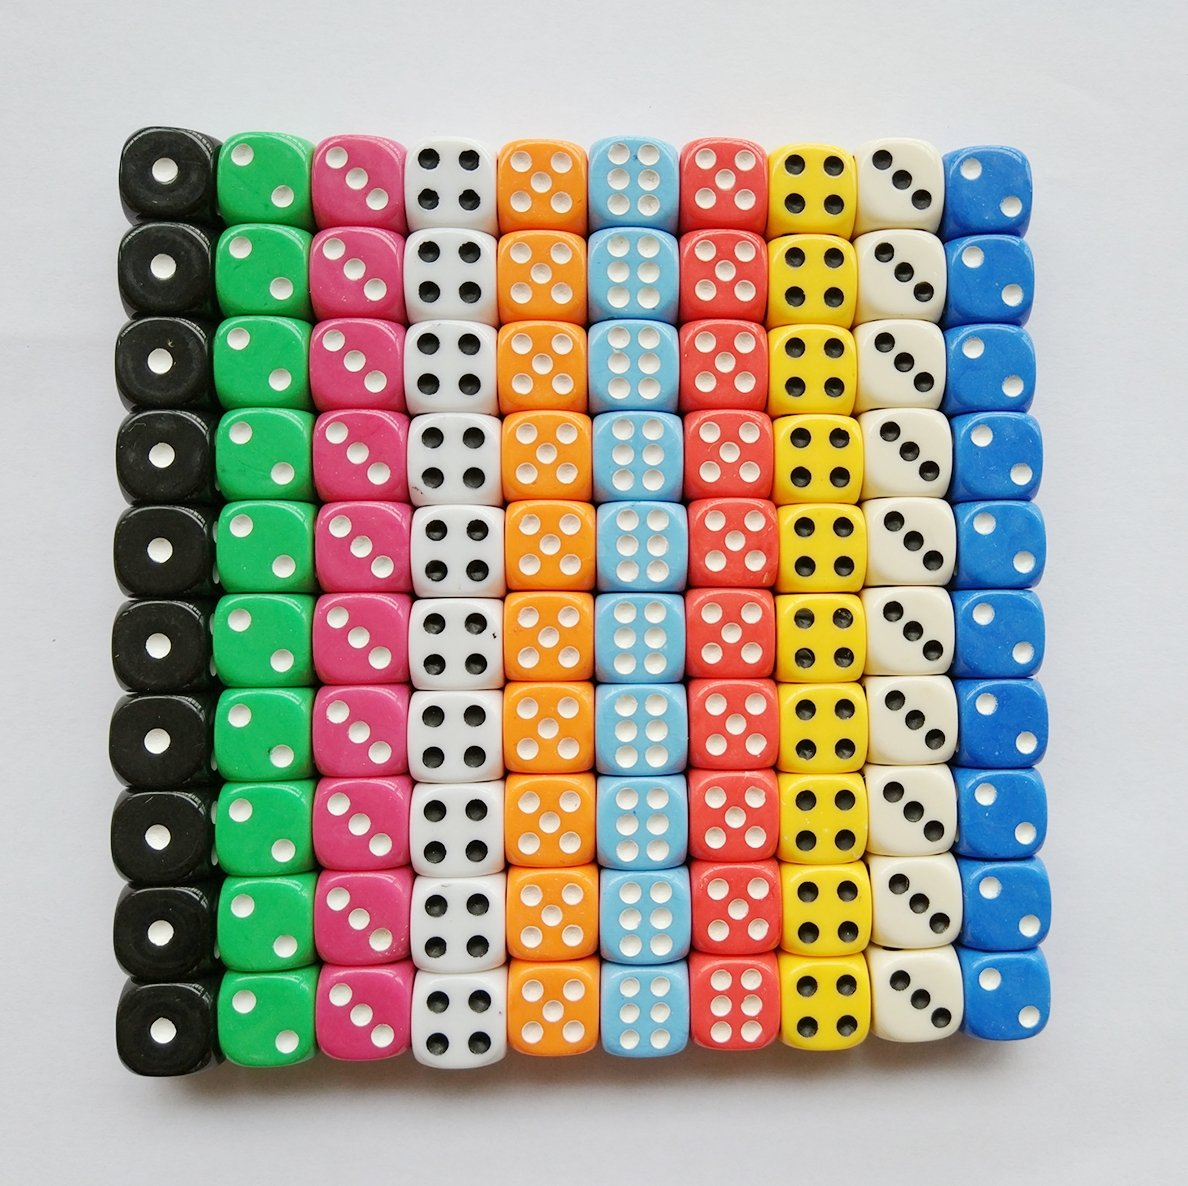 ANSTER100 Pieces Game Dice Set, 10 Colors Round Corner Dice Play Games Like Tenzi, Farkle, Yahtzee, Bunco or Teaching Math